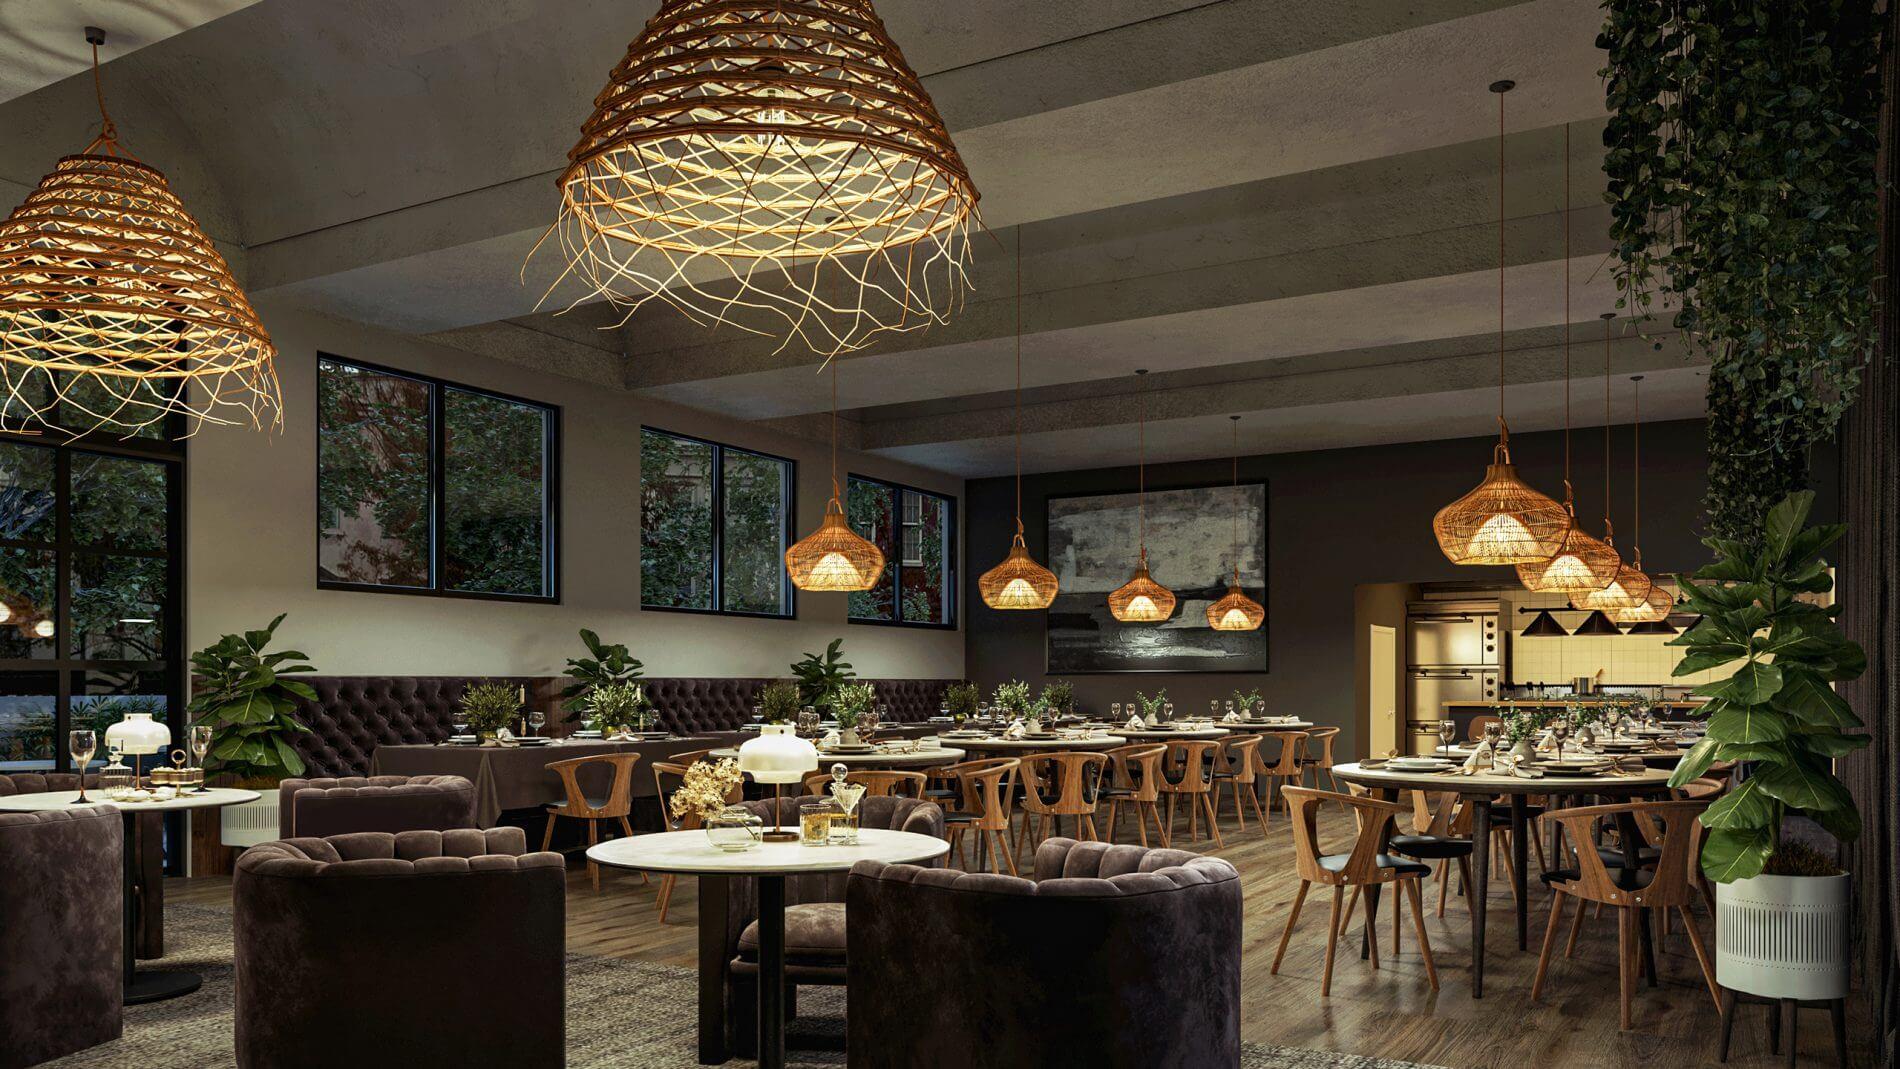 3d rendering of a restaurant